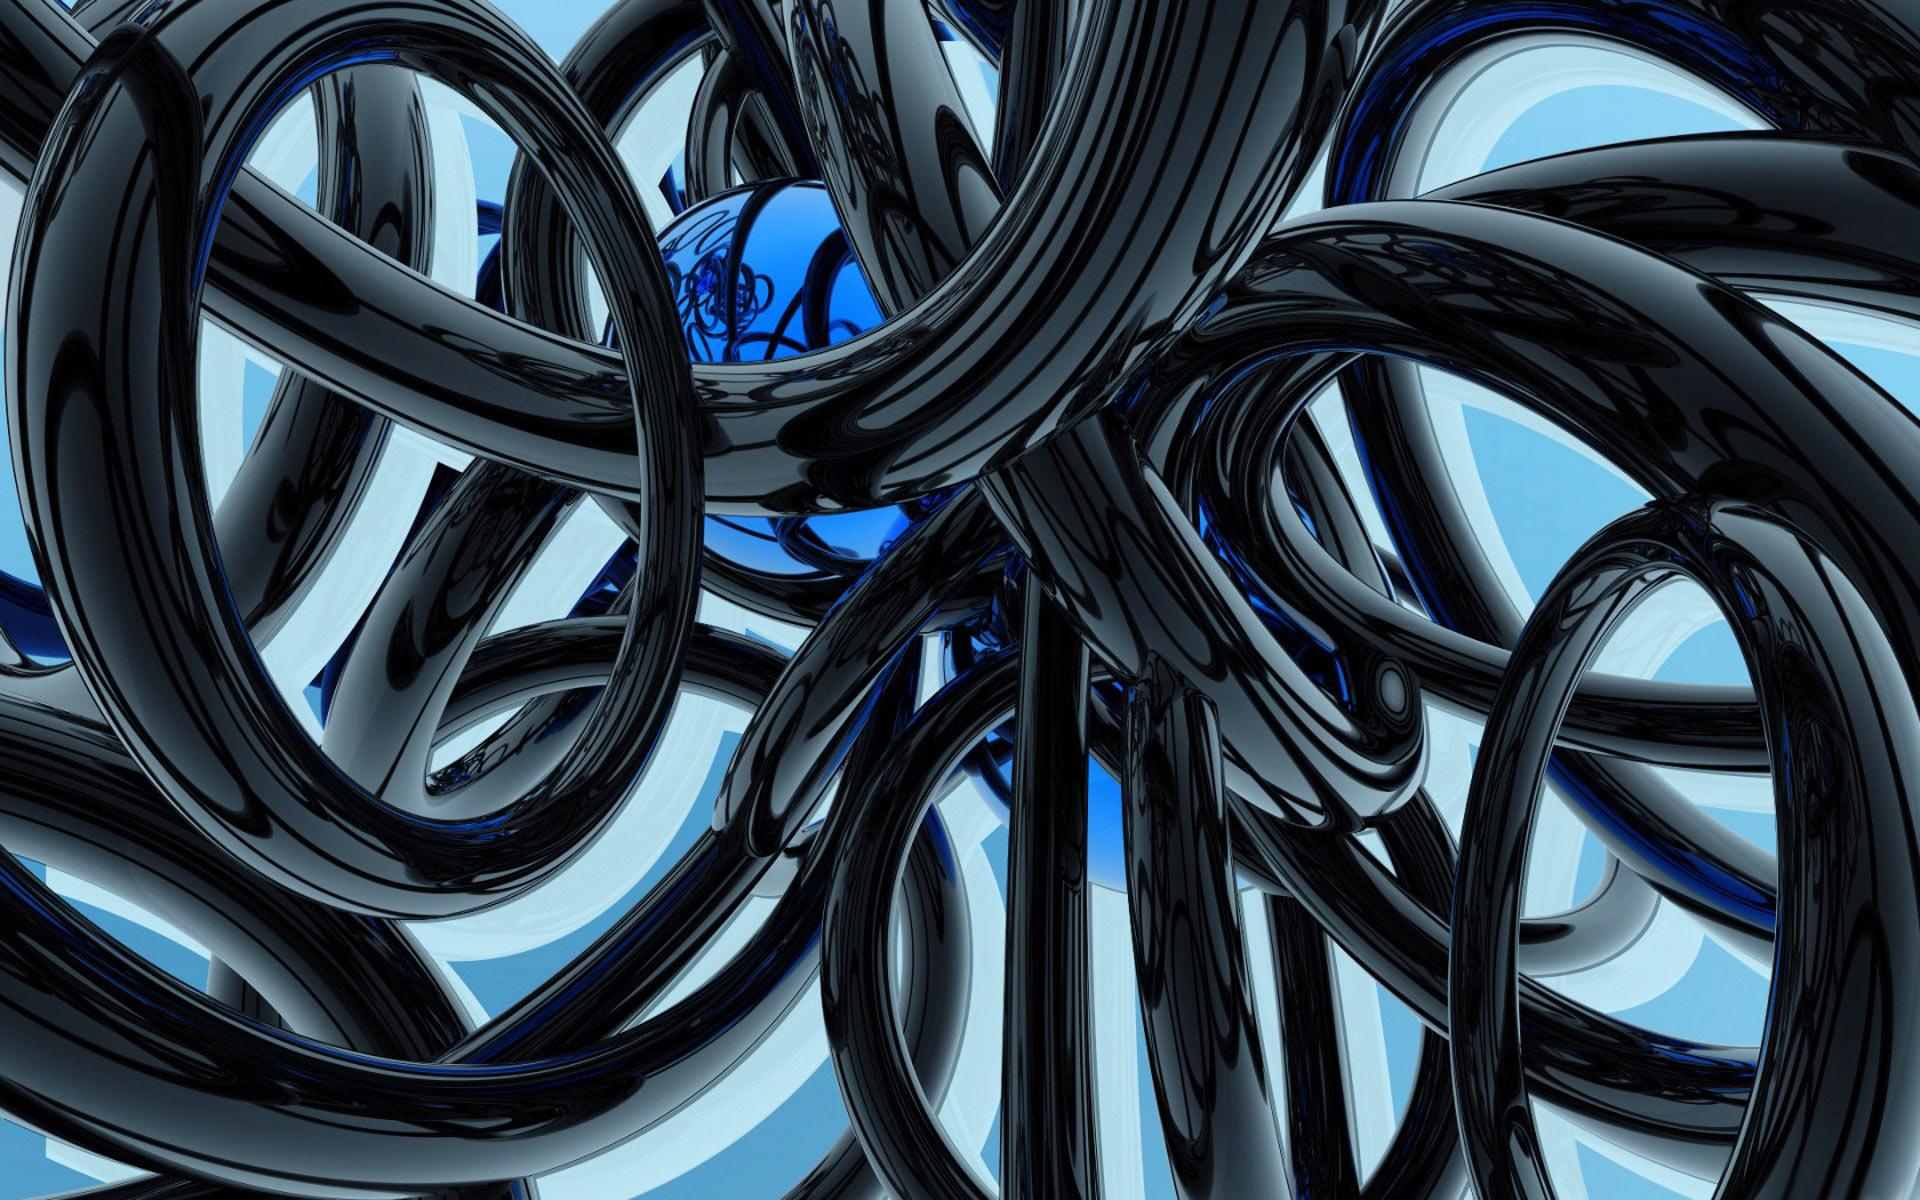 Cooling system 3d abstract Desktop Wallpaper 1920x1200